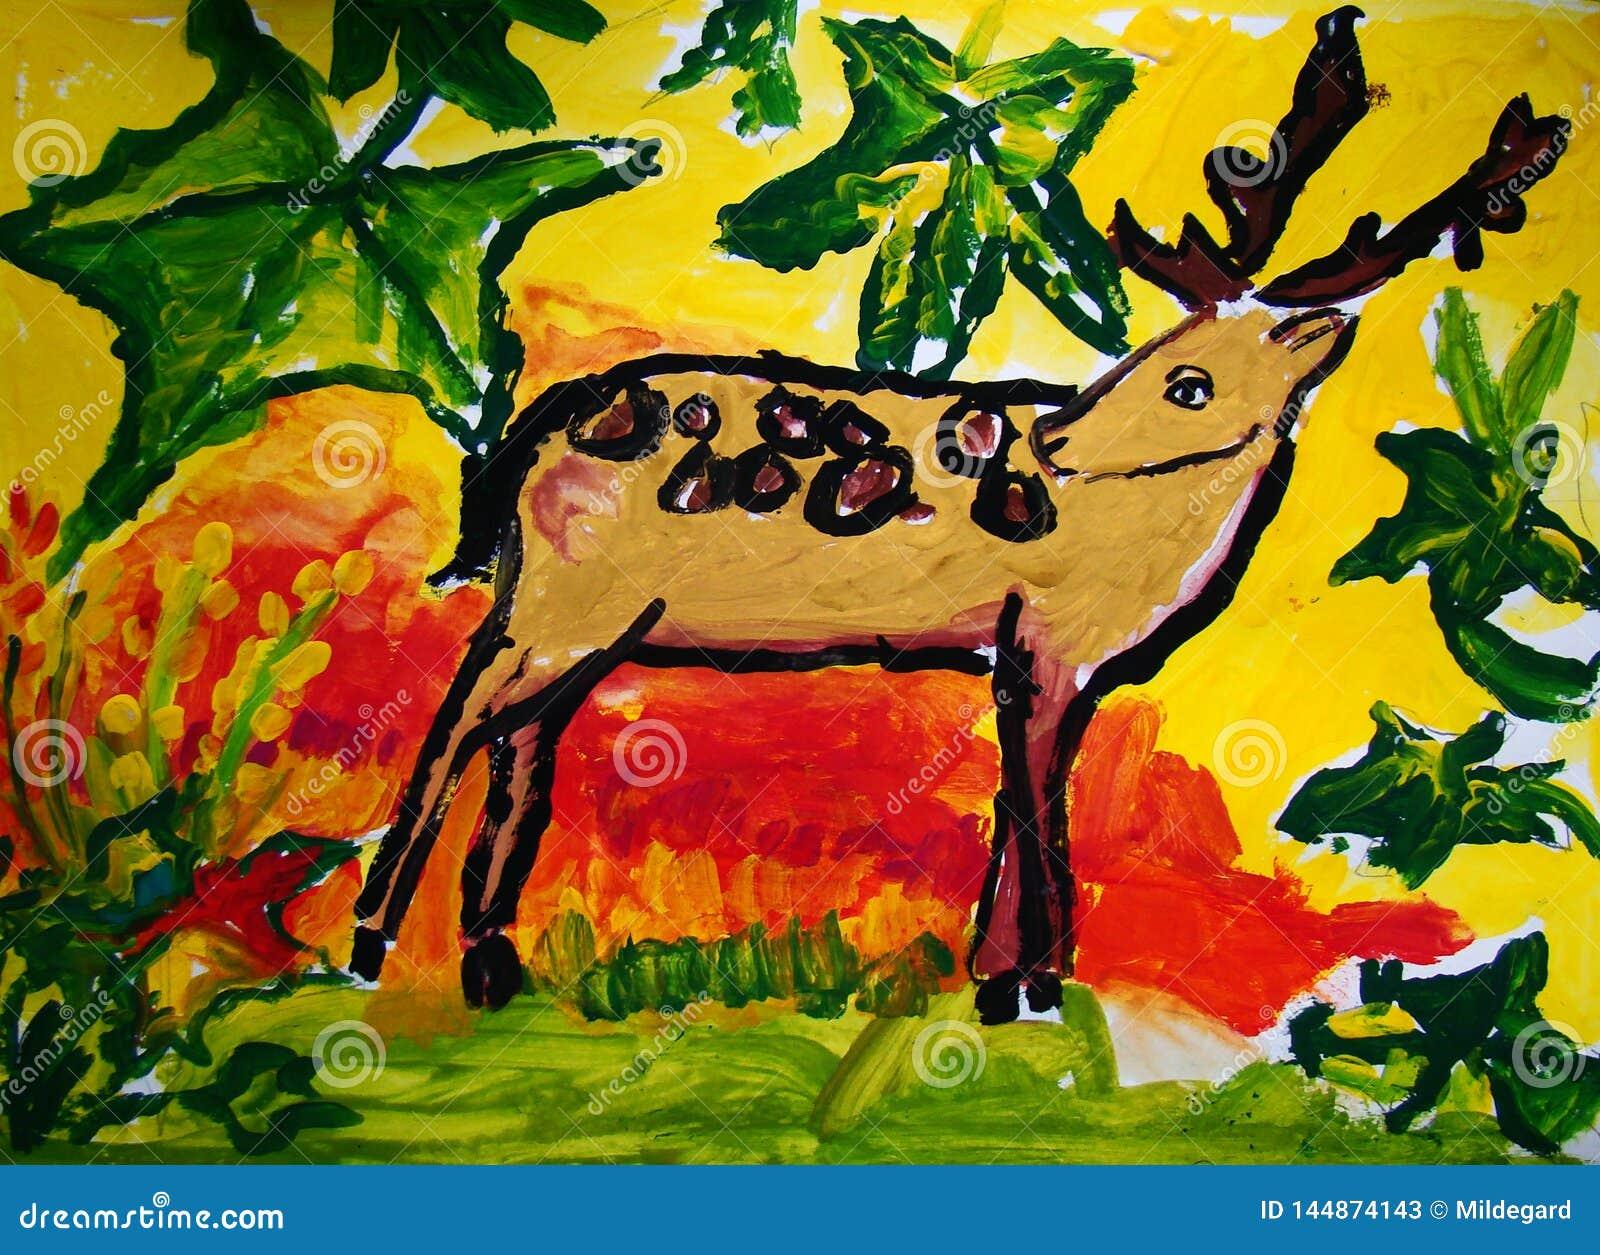 Gentle deer painted by child